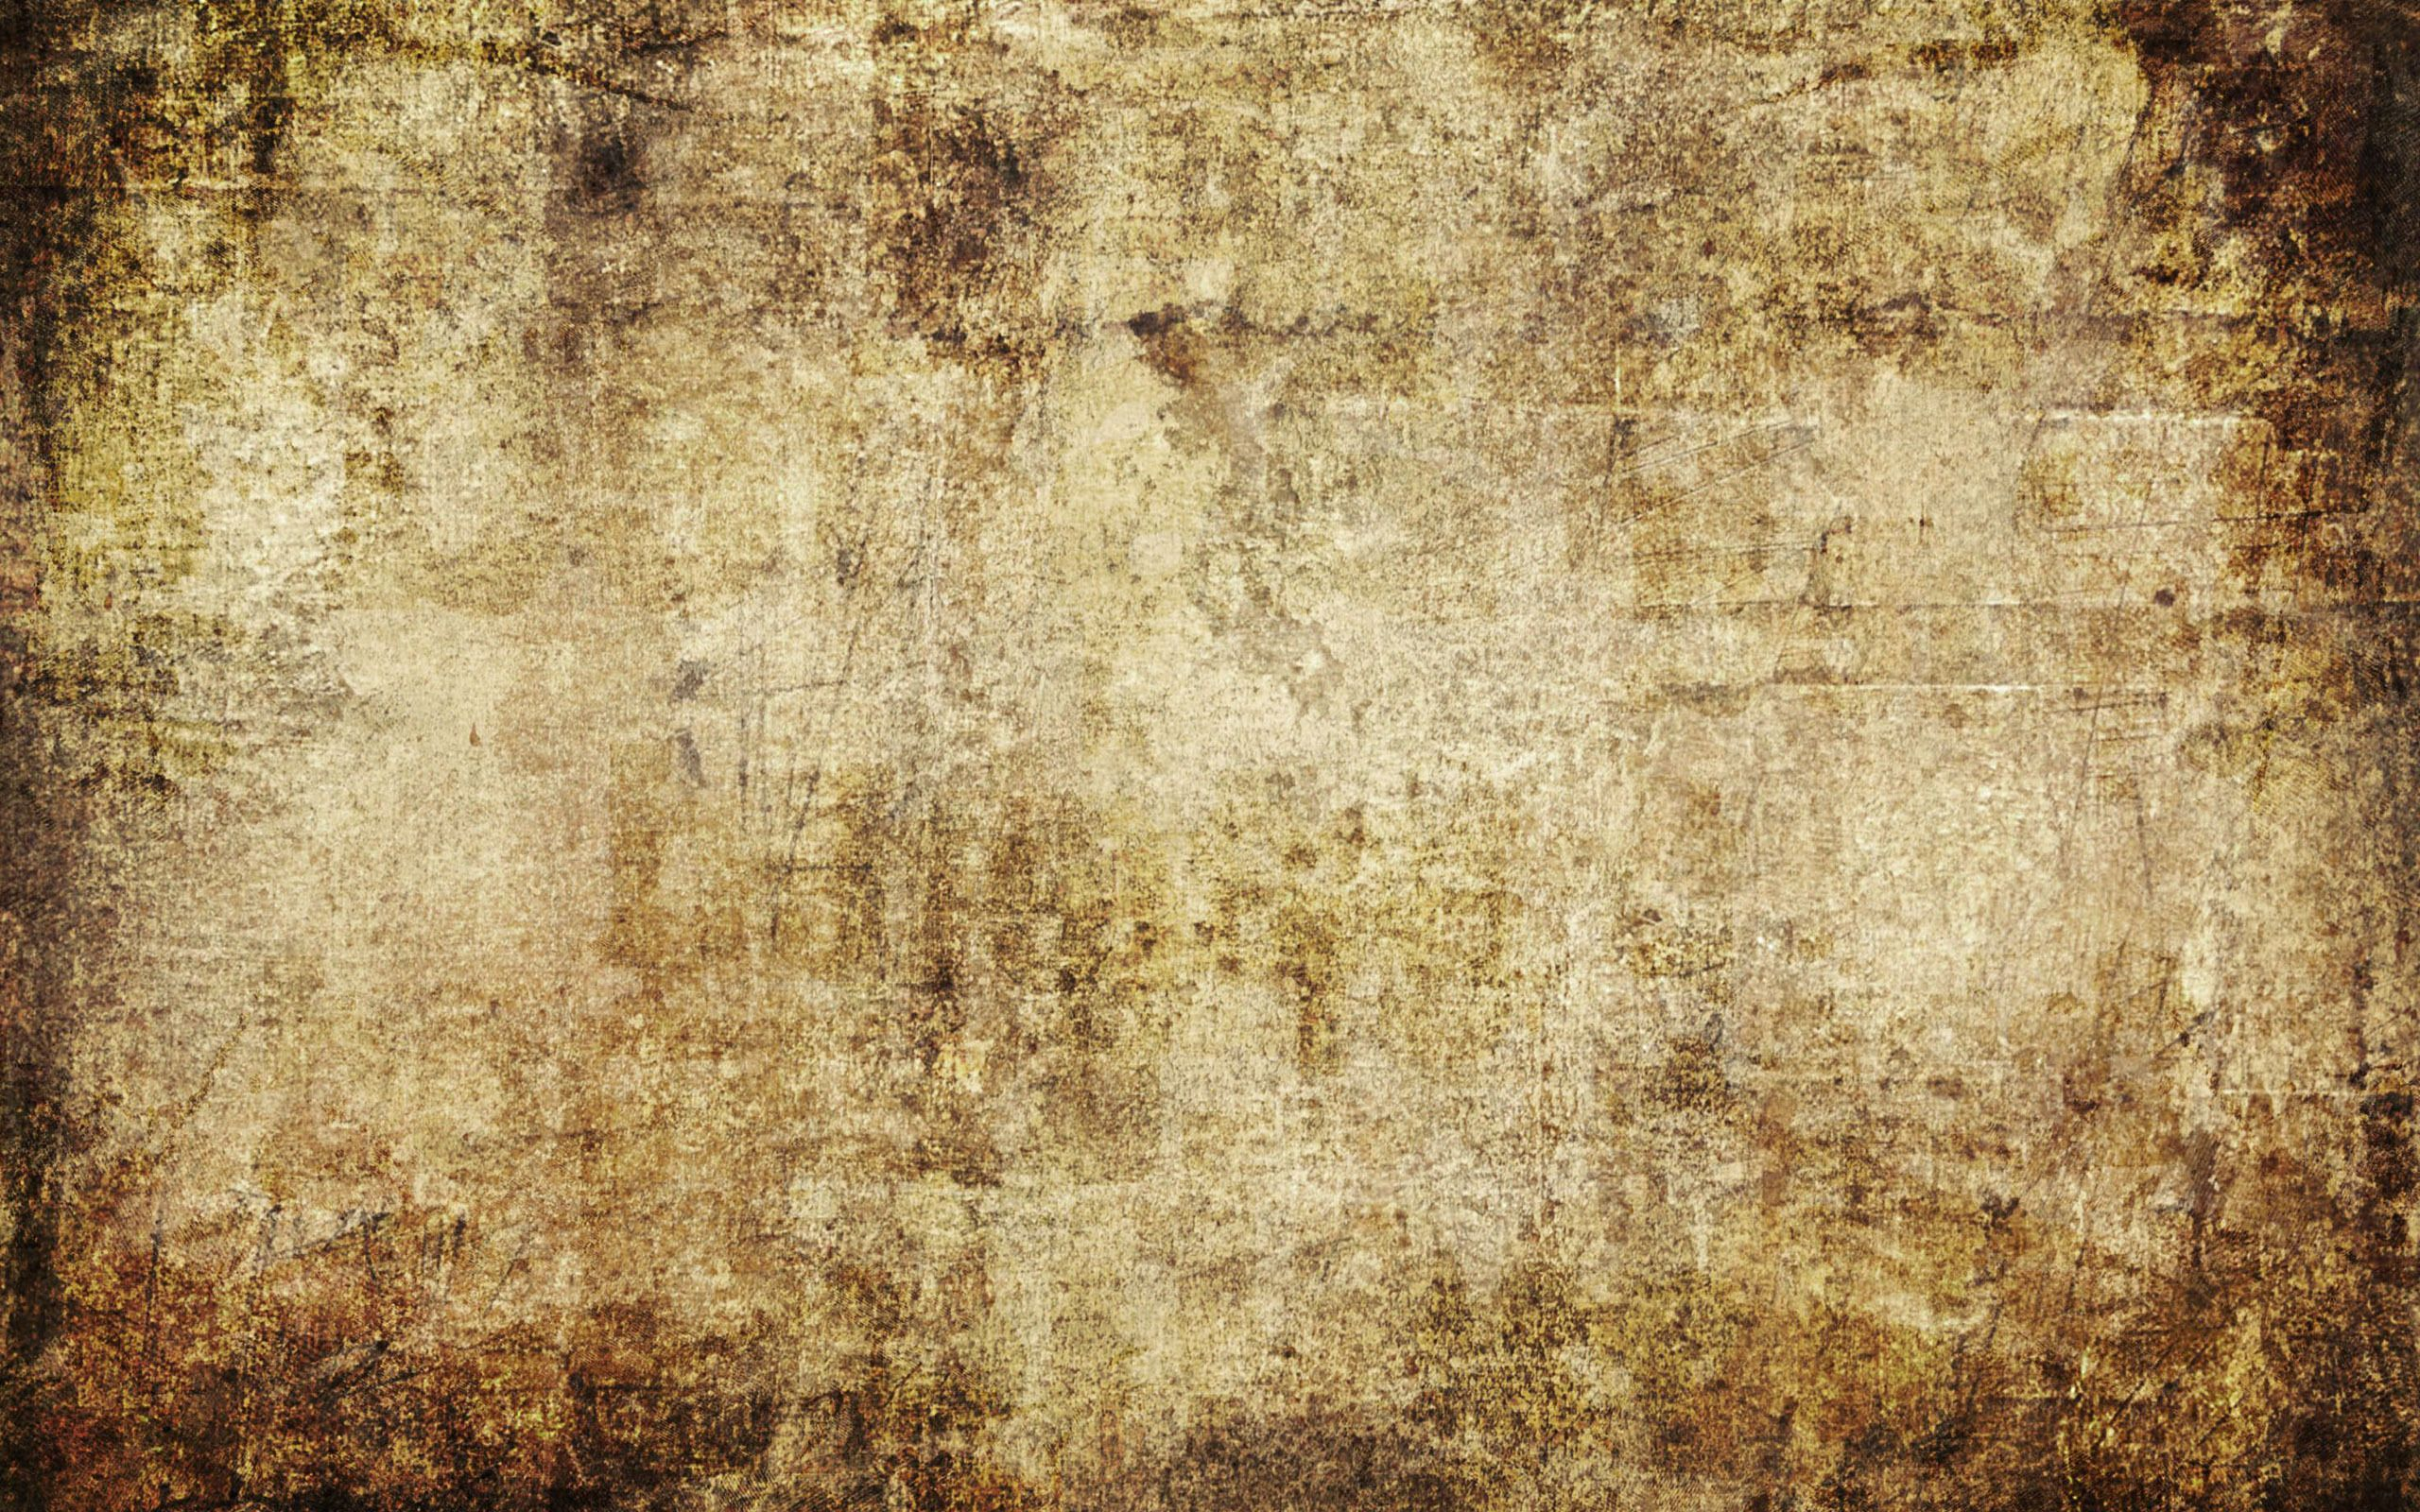 Grunge Texture Wallpapers - Top Free Grunge Texture Backgrounds -  WallpaperAccess